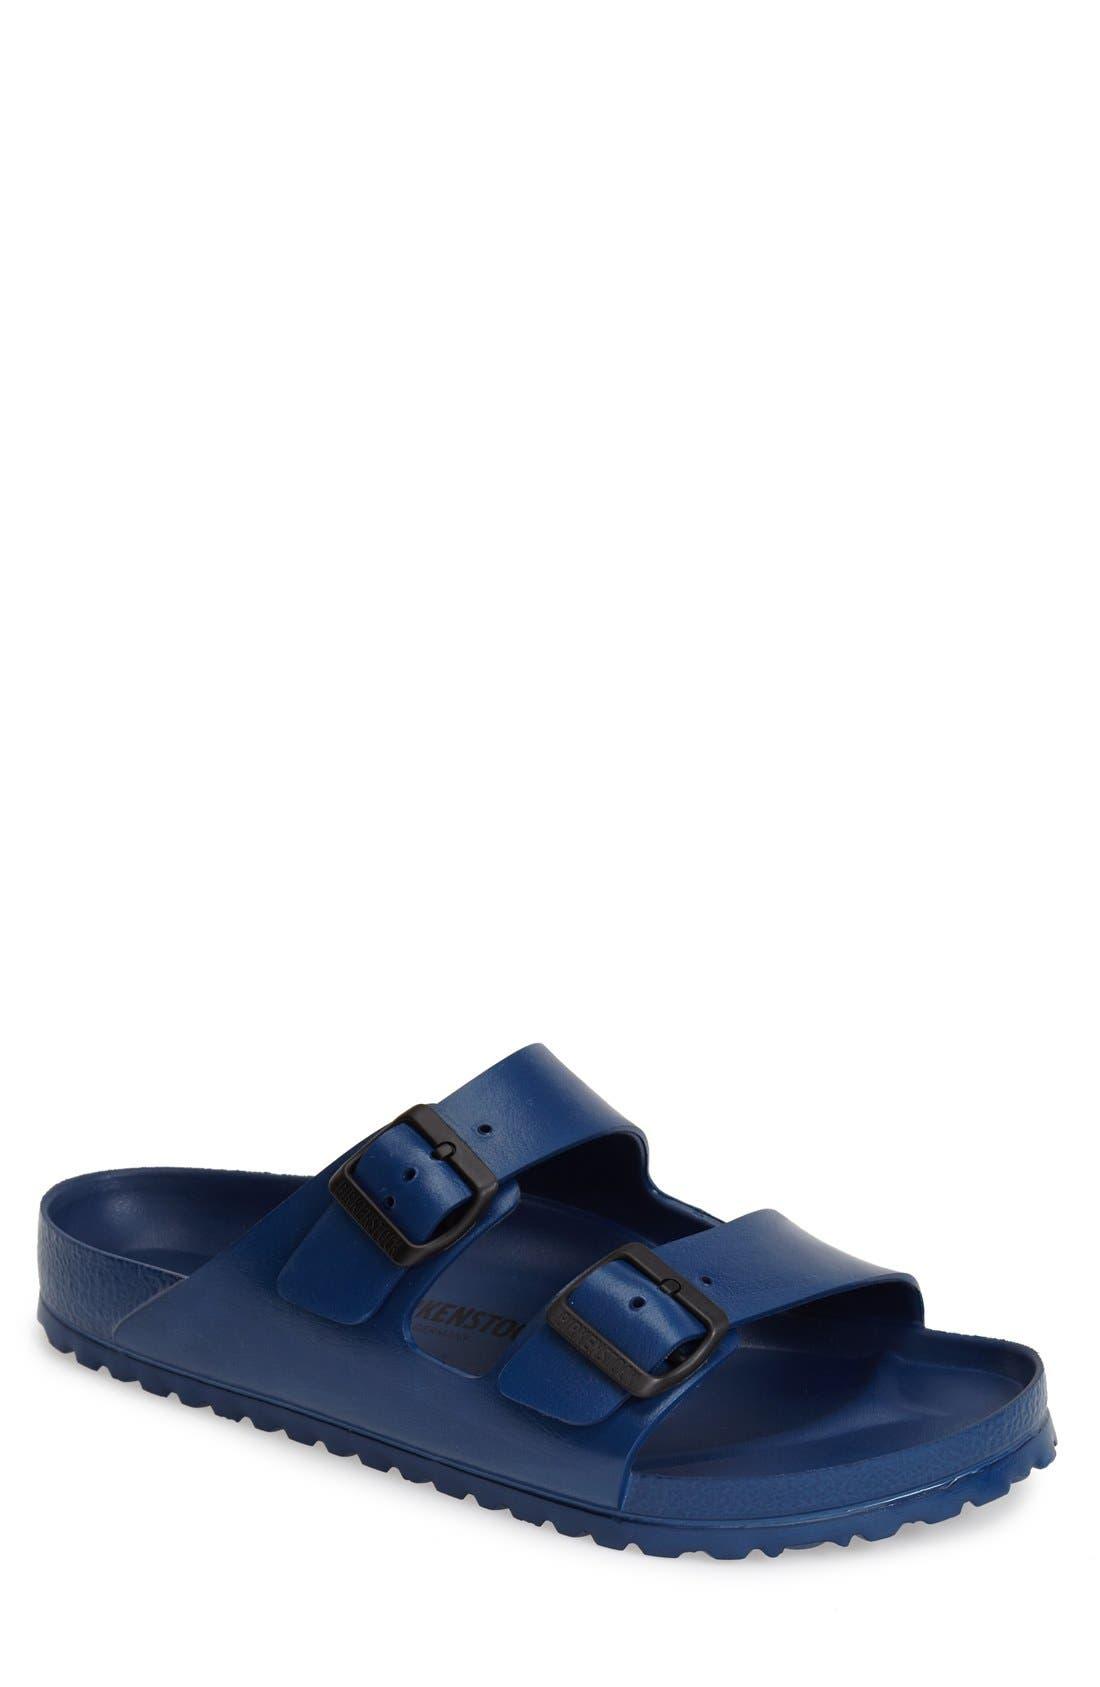 Alternate Image 1 Selected - Birkenstock 'Essentials - Arizona EVA' Waterproof Slide Sandal (Men)